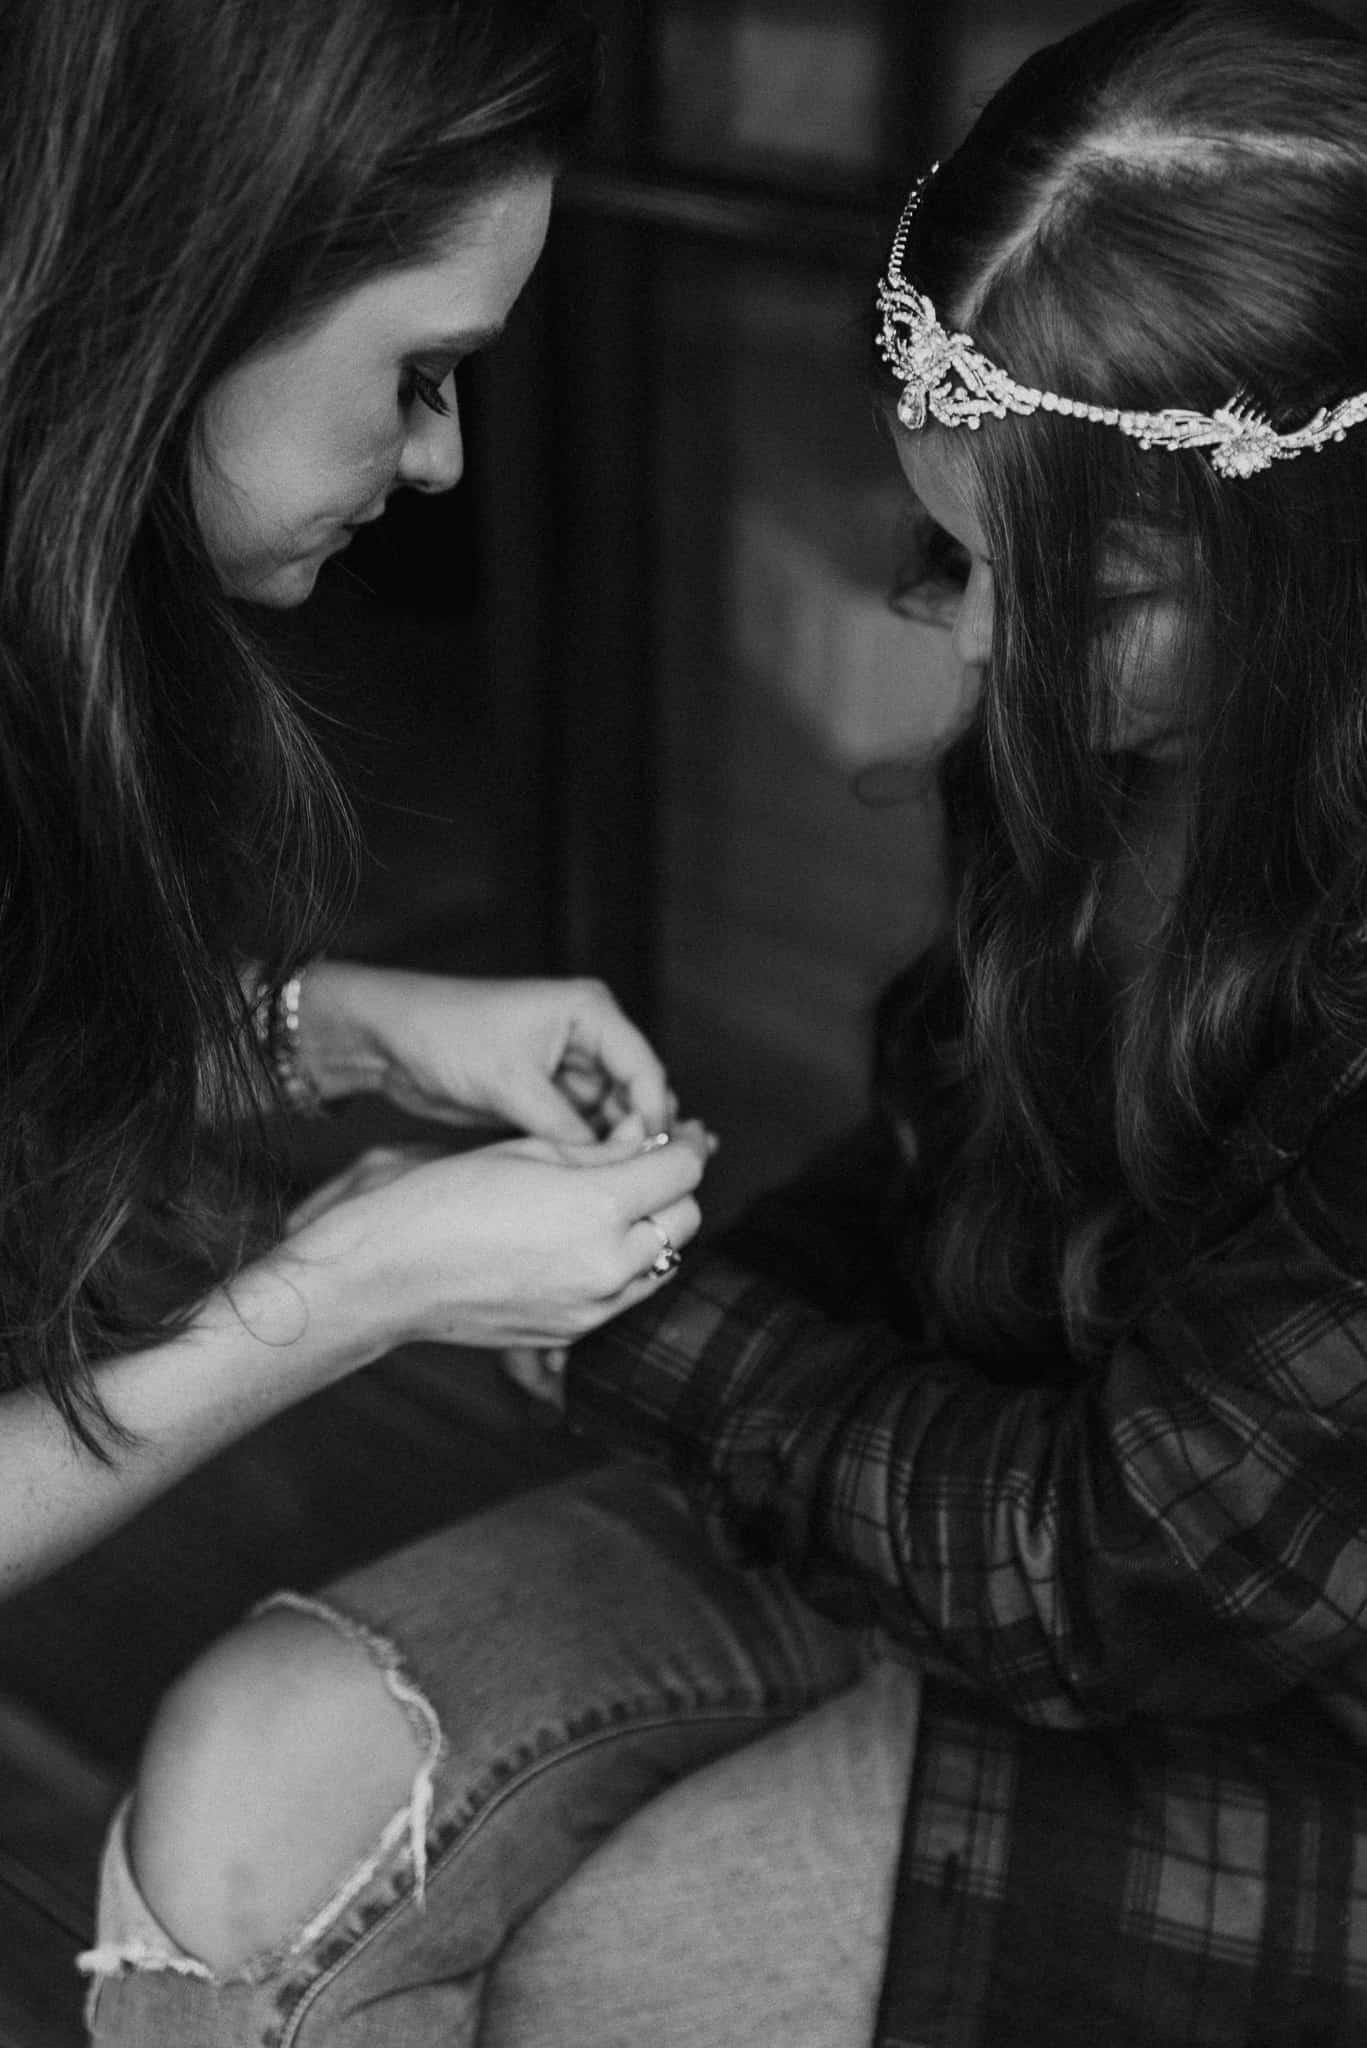 Friend helps bride put on bracelet Captured by James White Hunter Valley Wedding Photographer